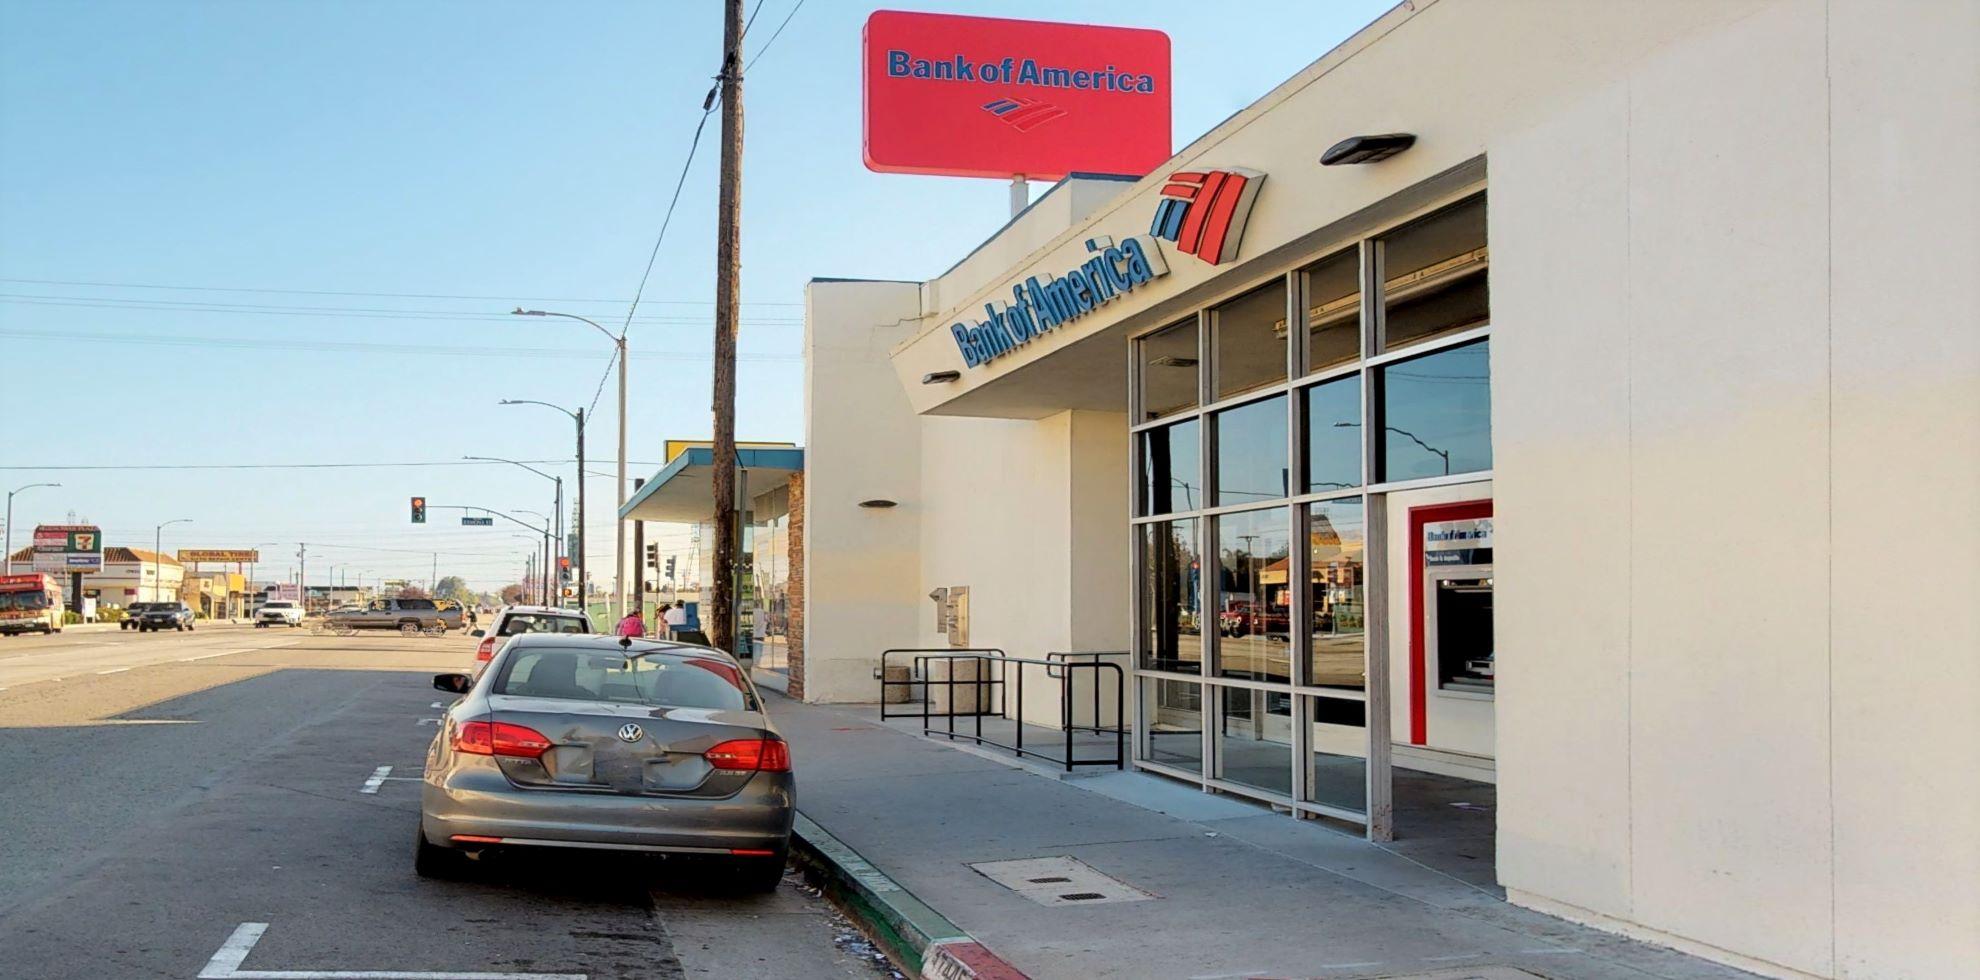 Bank of America financial center with walk-up ATM | 17445 Bellflower Blvd, Bellflower, CA 90706